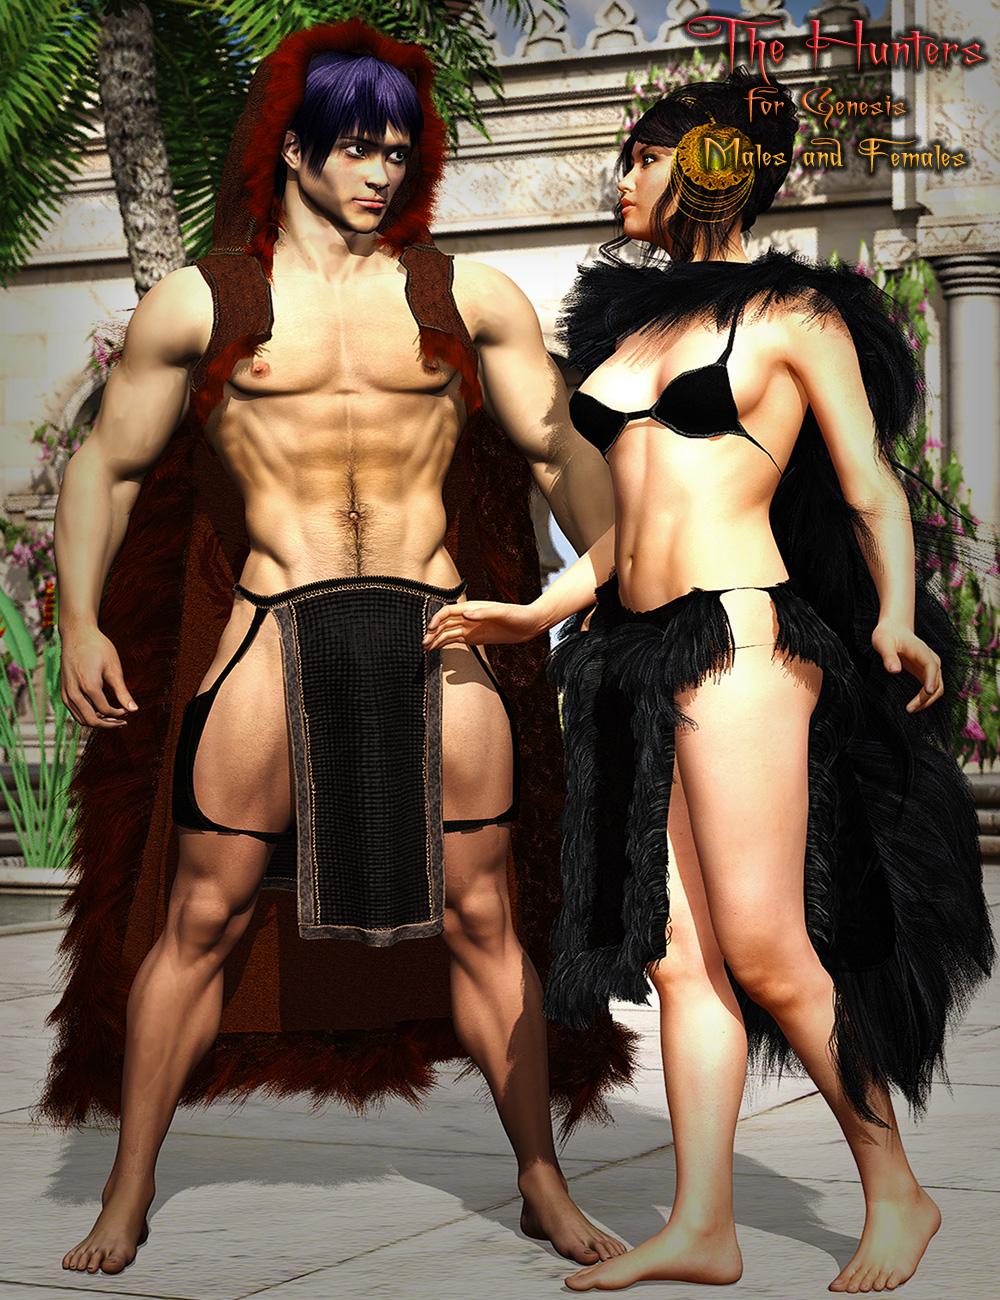 The Hunters For Genesis 2 Bundle by: MartinJFrost, 3D Models by Daz 3D